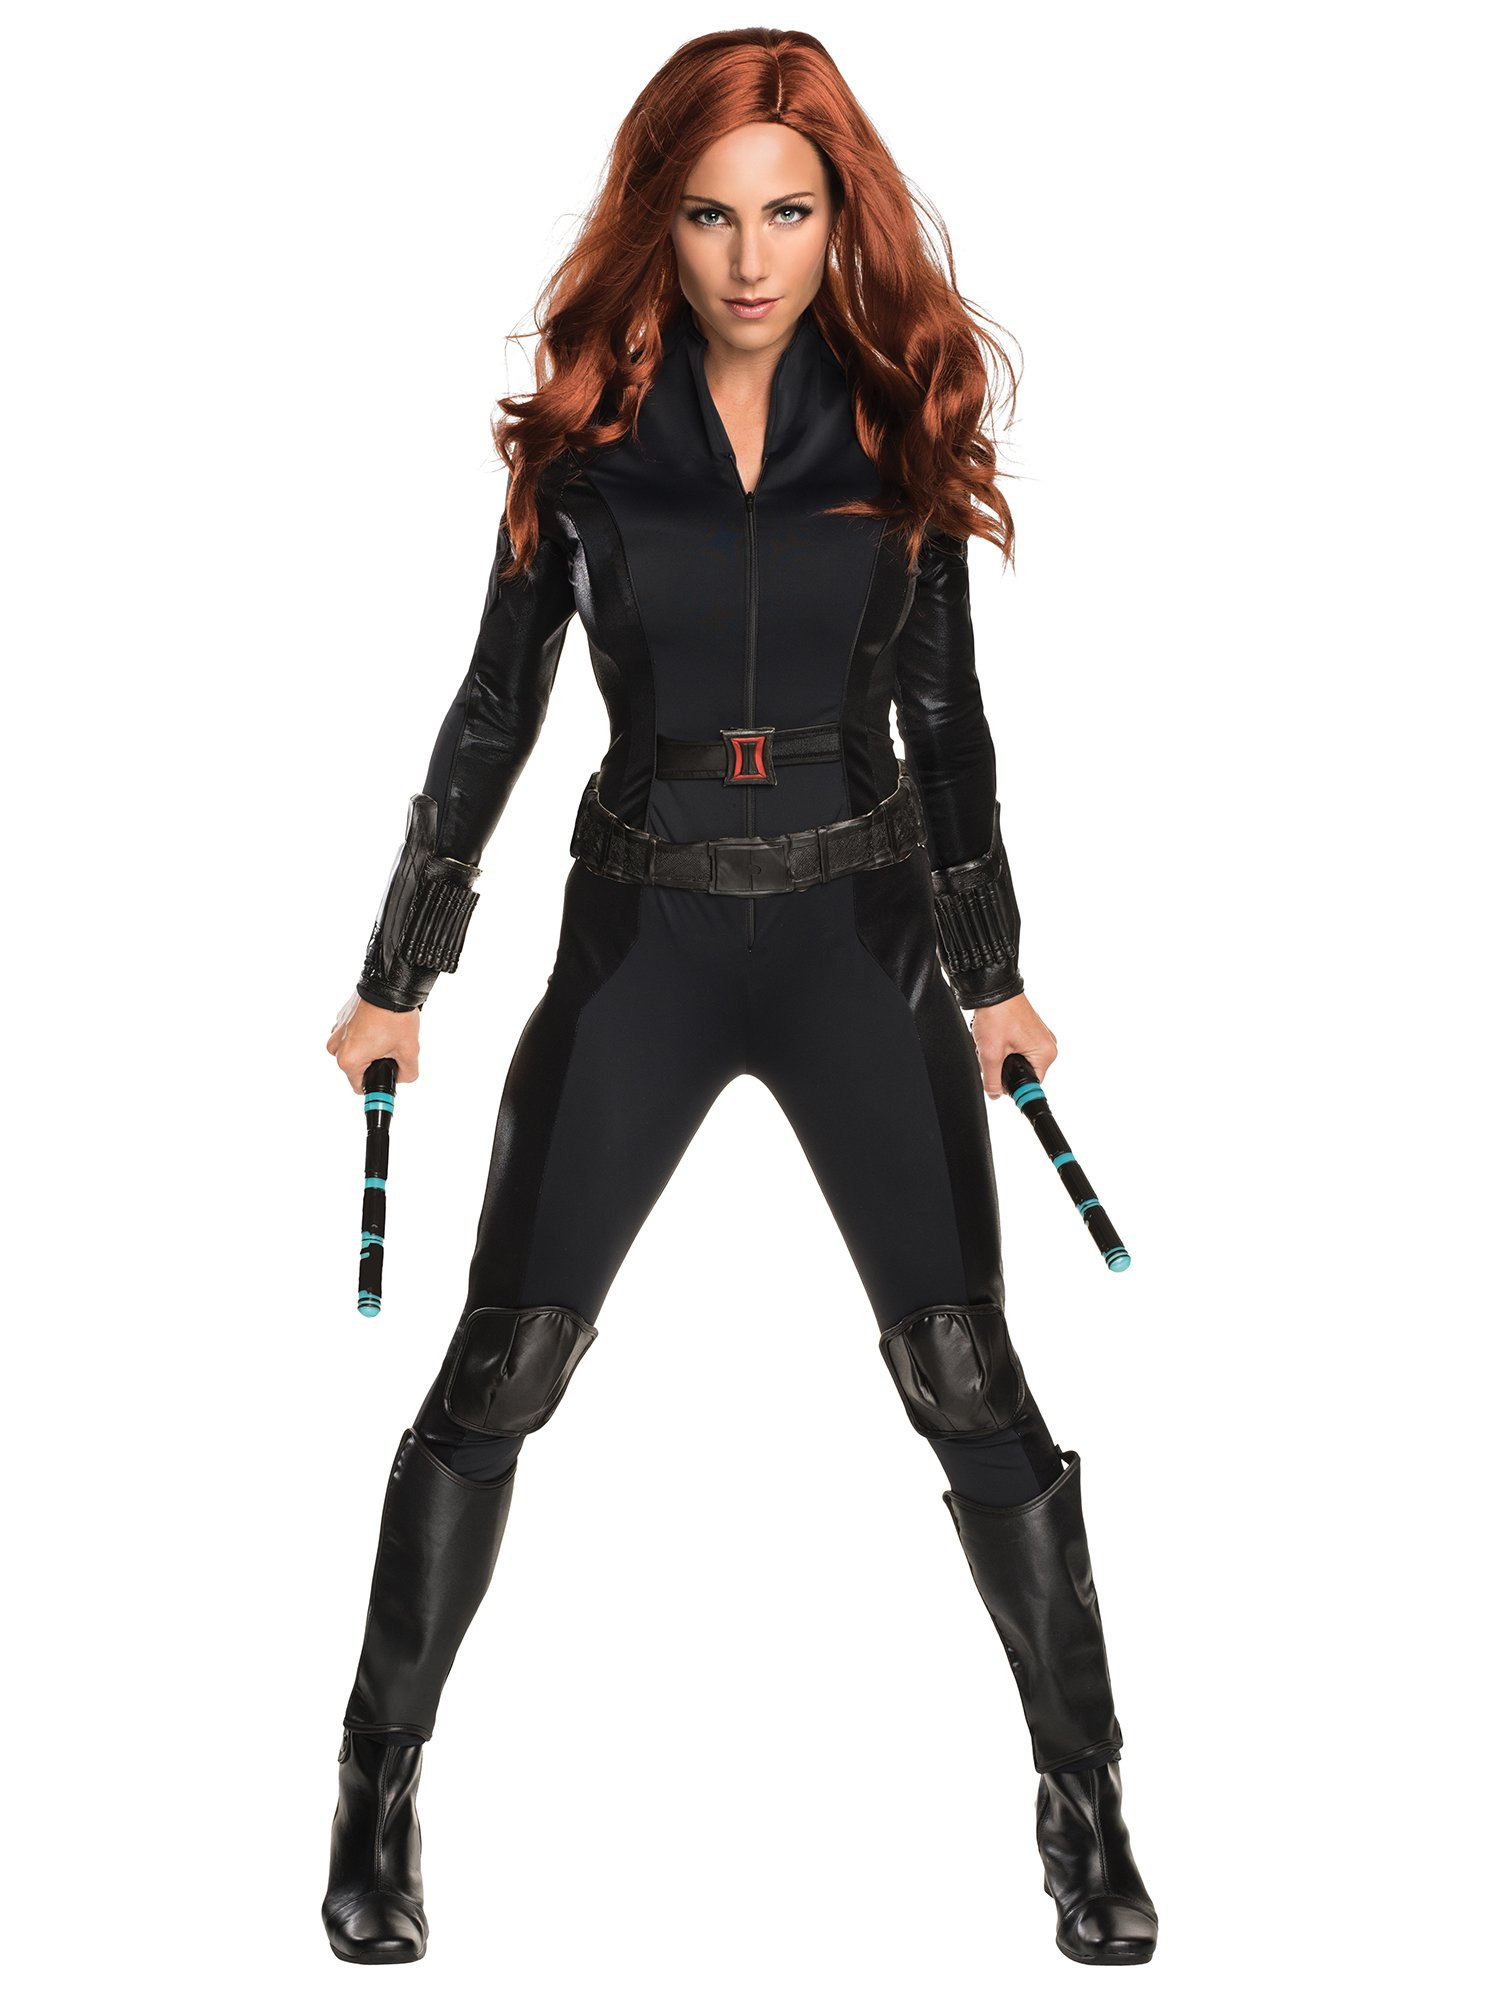 Rubie's Costume Co Women's Captain America: Civil War Widow Costume, Black, Small by Rubie's Costume Co